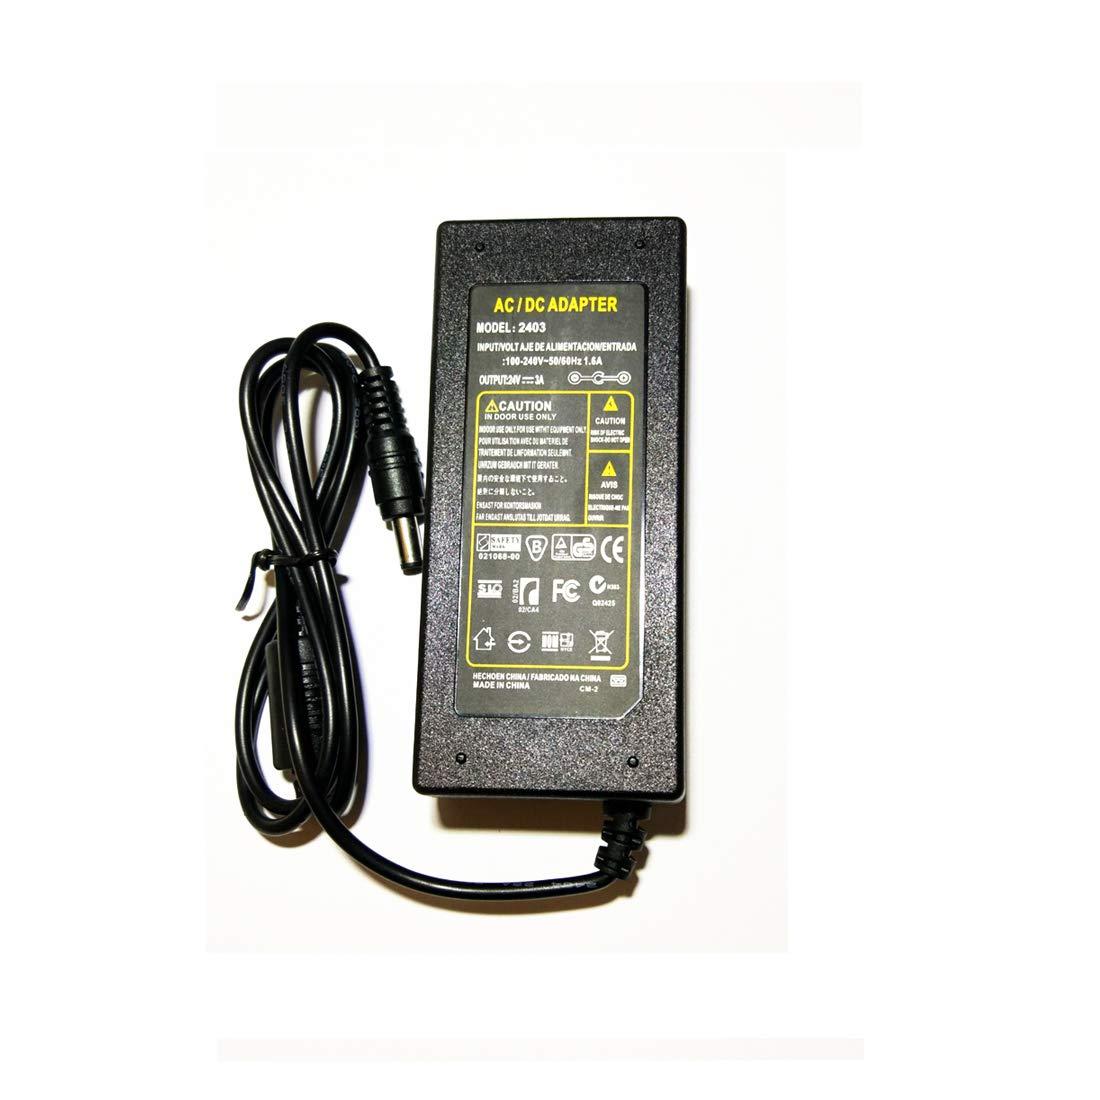 Netzteil 24V 3A 72W Netzadapter Transformator Trafo f/ür LED Strip Streifen Light Lichterkette,Kamera,LCD Monitor